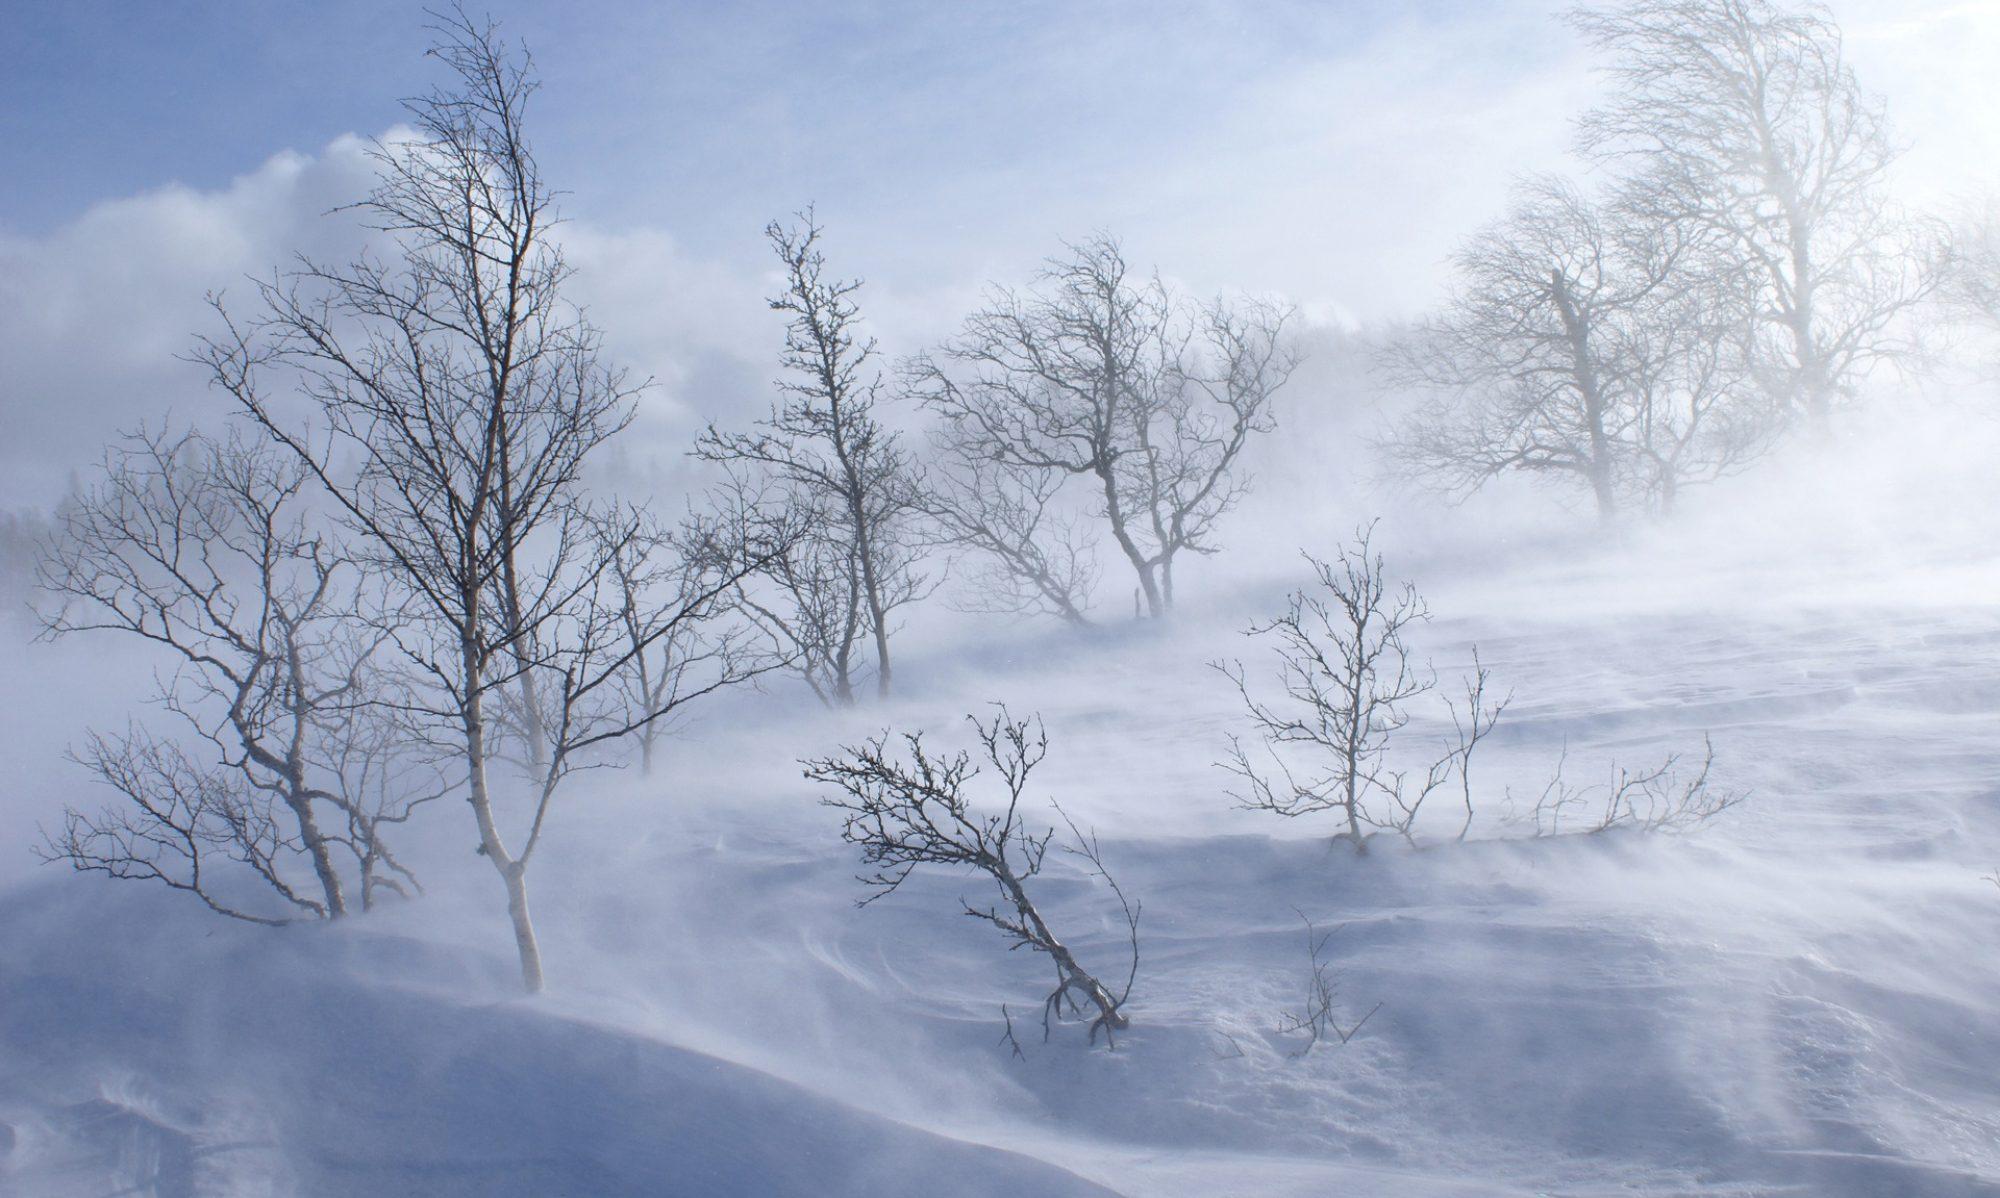 Blizzard Hosting by Snowdrift